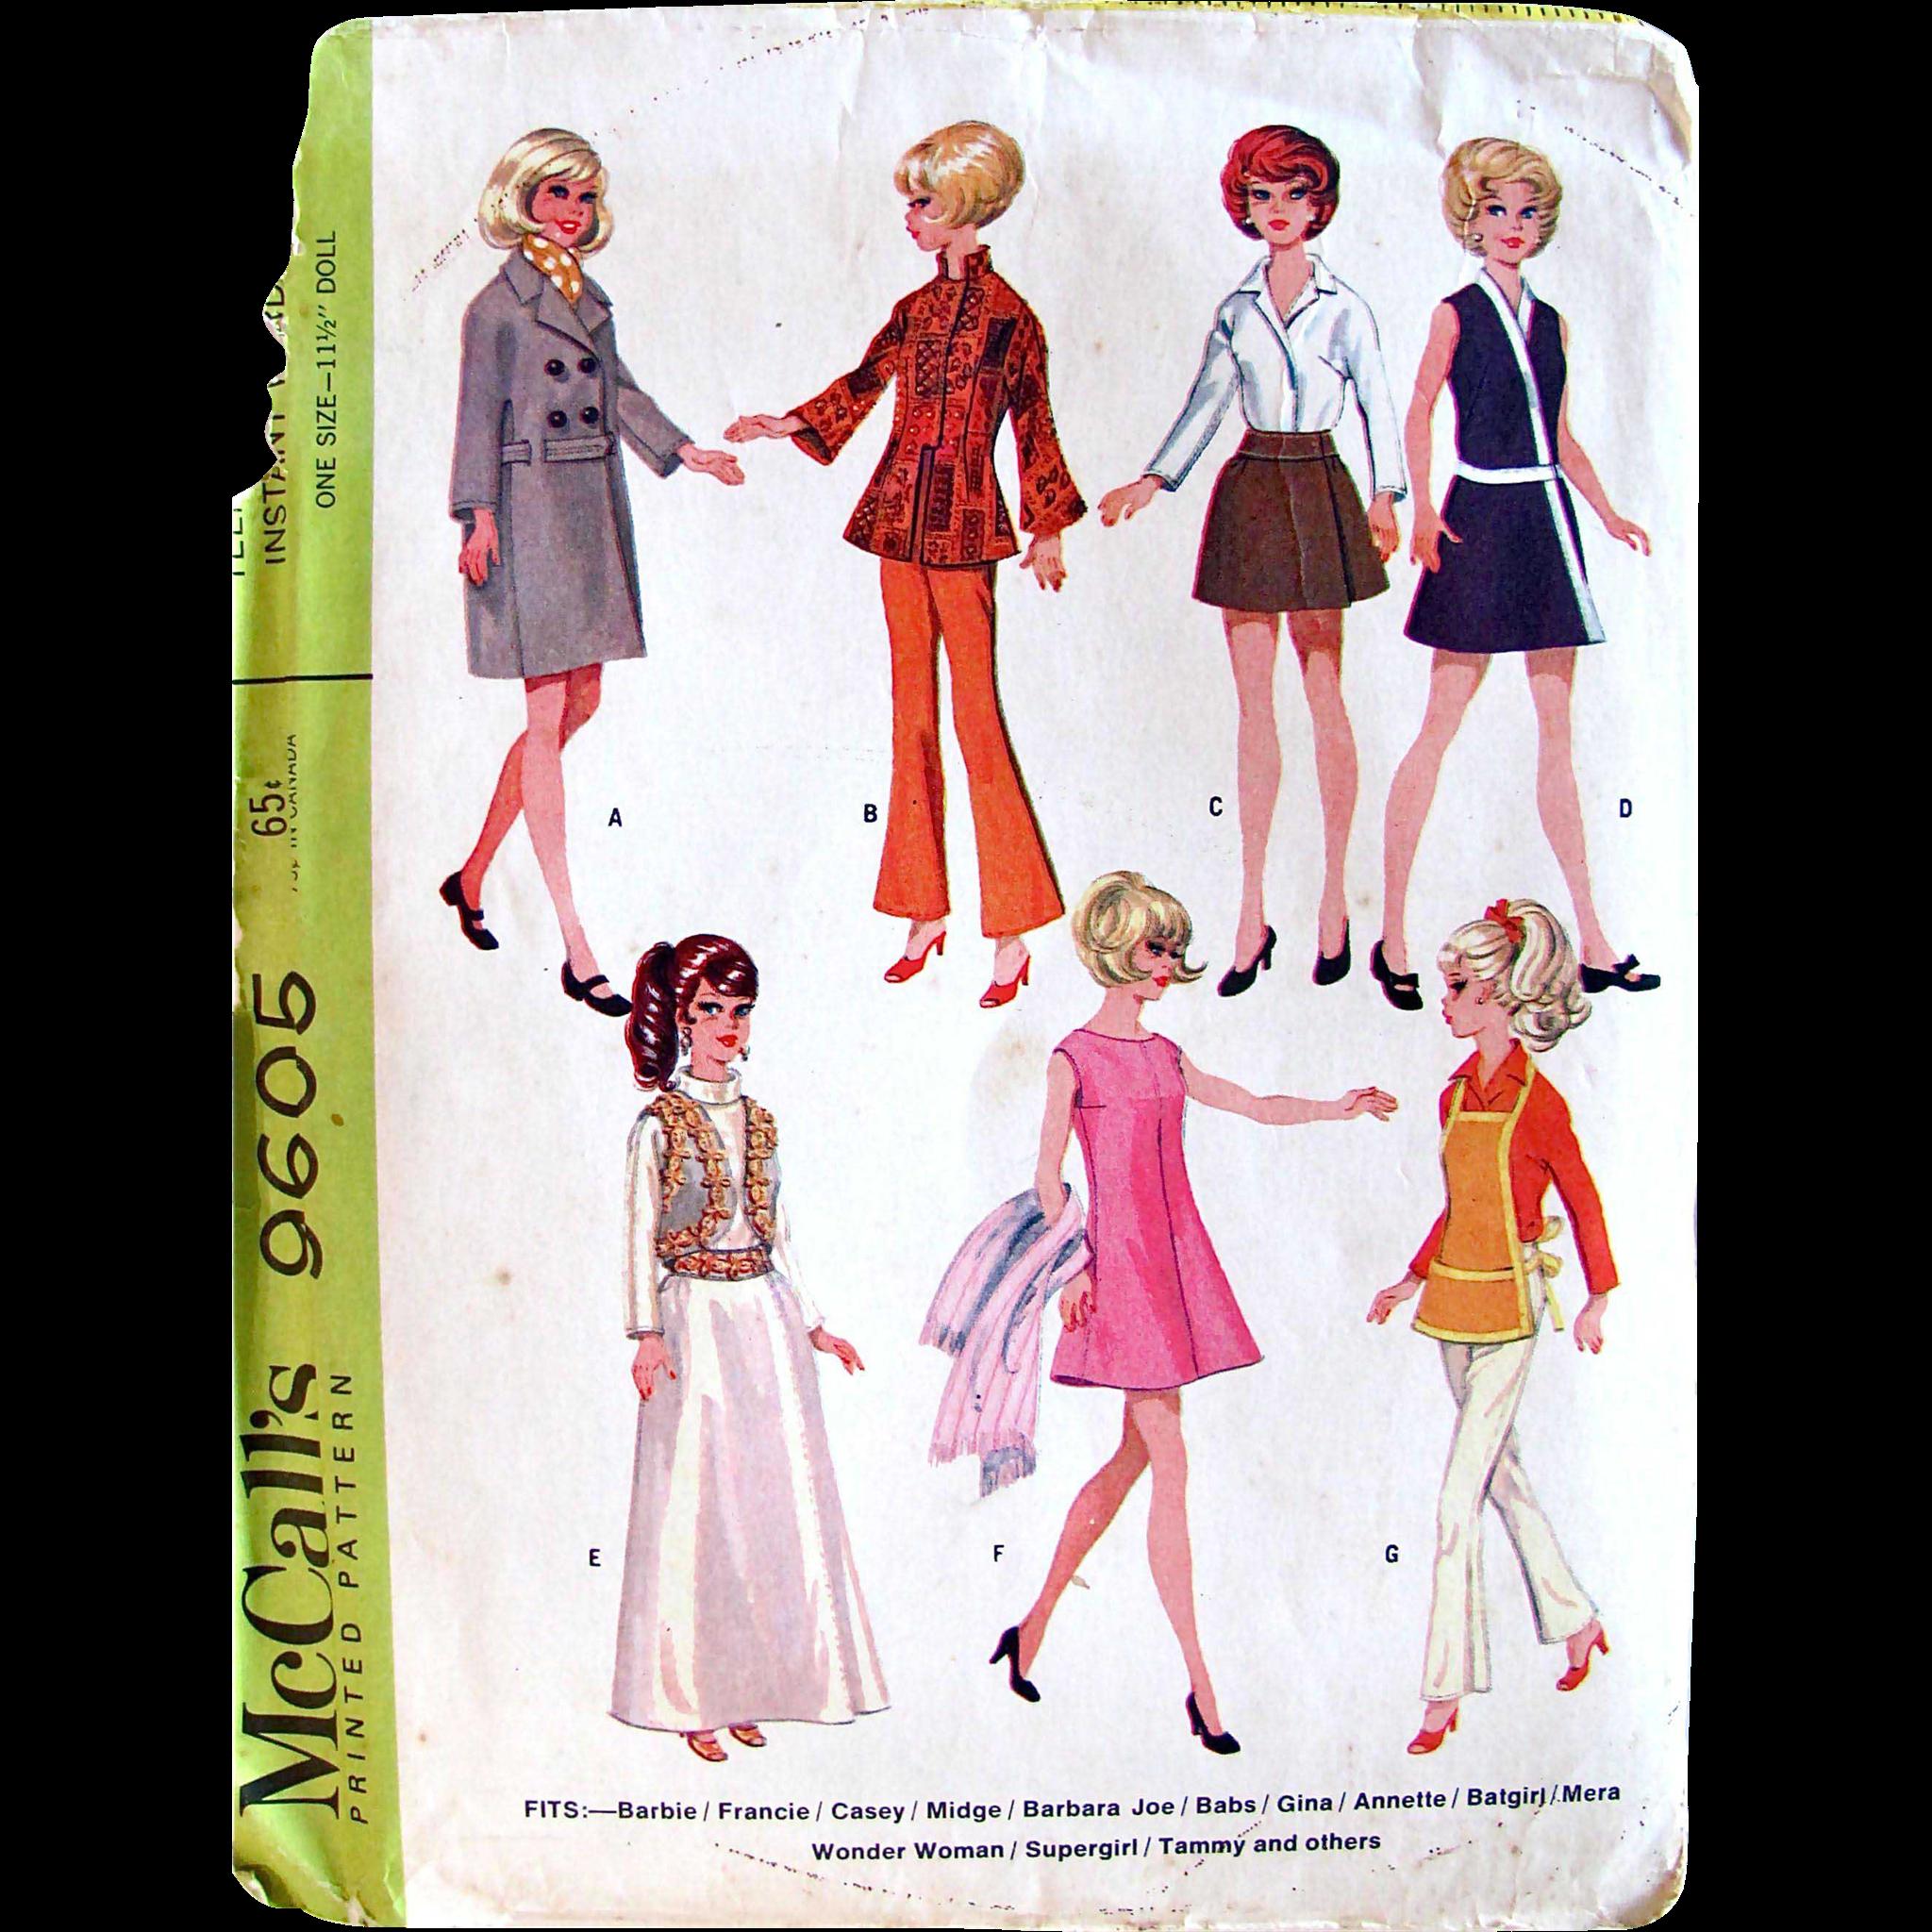 Barbie Dolls Instant Wardrobe Pattern, McCall's 9605, Vintage 1968, Uncut and Factory Folded, Fits 11-1/2 Inch Teen Fashion Dolls Barbie, Francie, Casey, Midge, Barbara Joe, Babs, Gina, Annette, Batgirl, Mera, Wonder Woman, Supergirl, Tammy